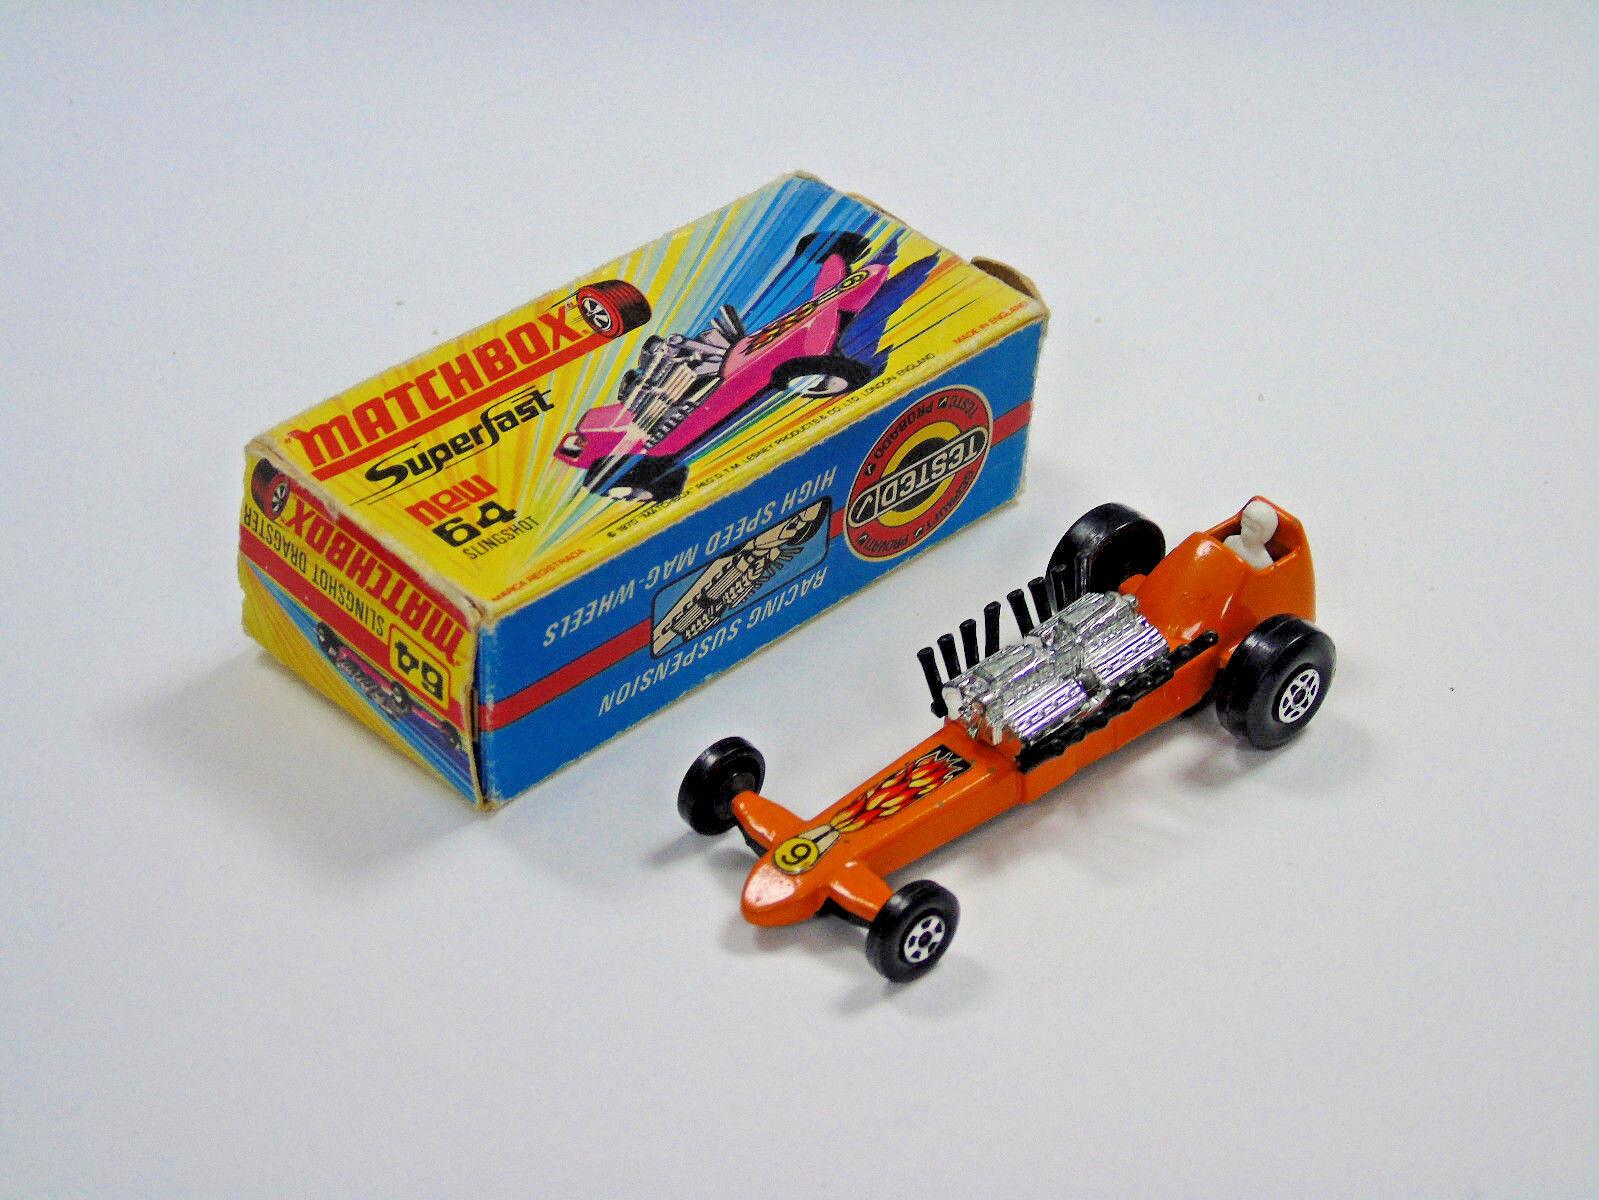 mejor calidad mejor precio No.64 1971 Matchbox súperfast Lesney Slingshot Dragster Naranja Naranja Naranja 1 64 ESCALA en Caja  Entrega directa y rápida de fábrica